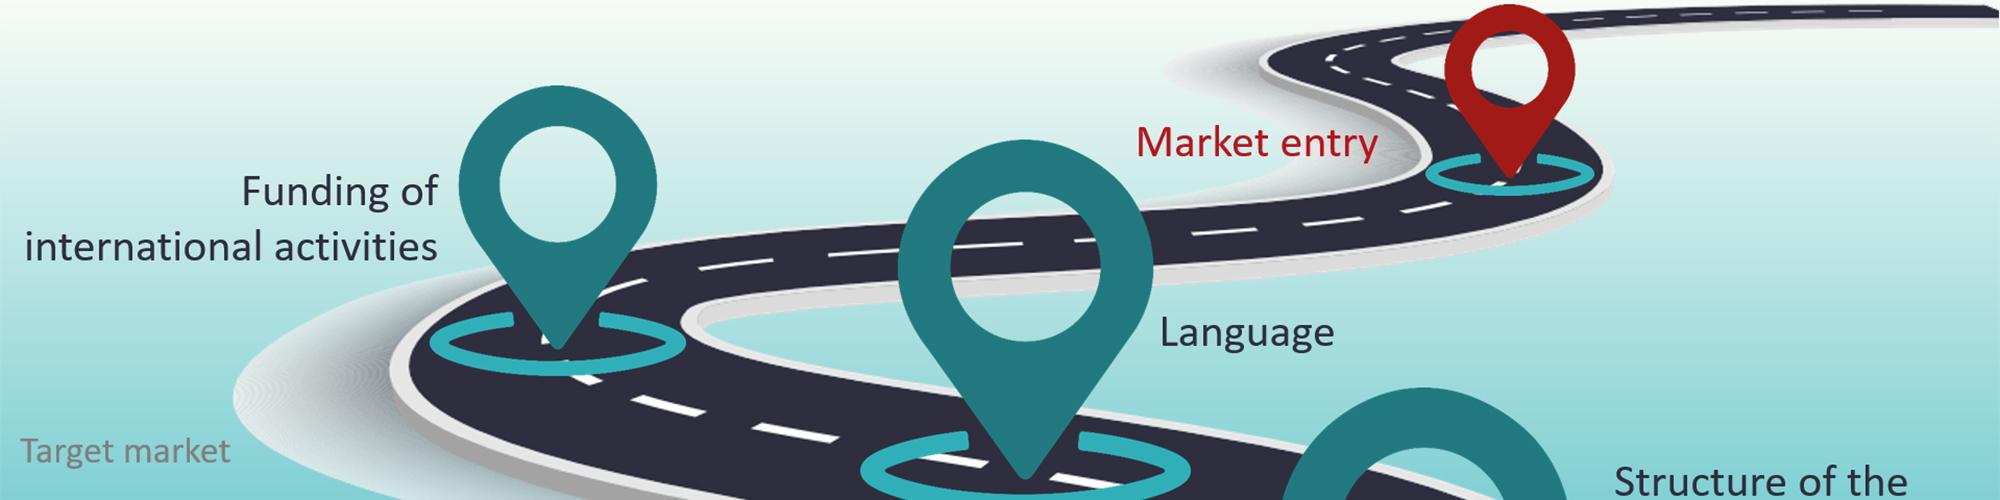 Step 4: Roadmap to market